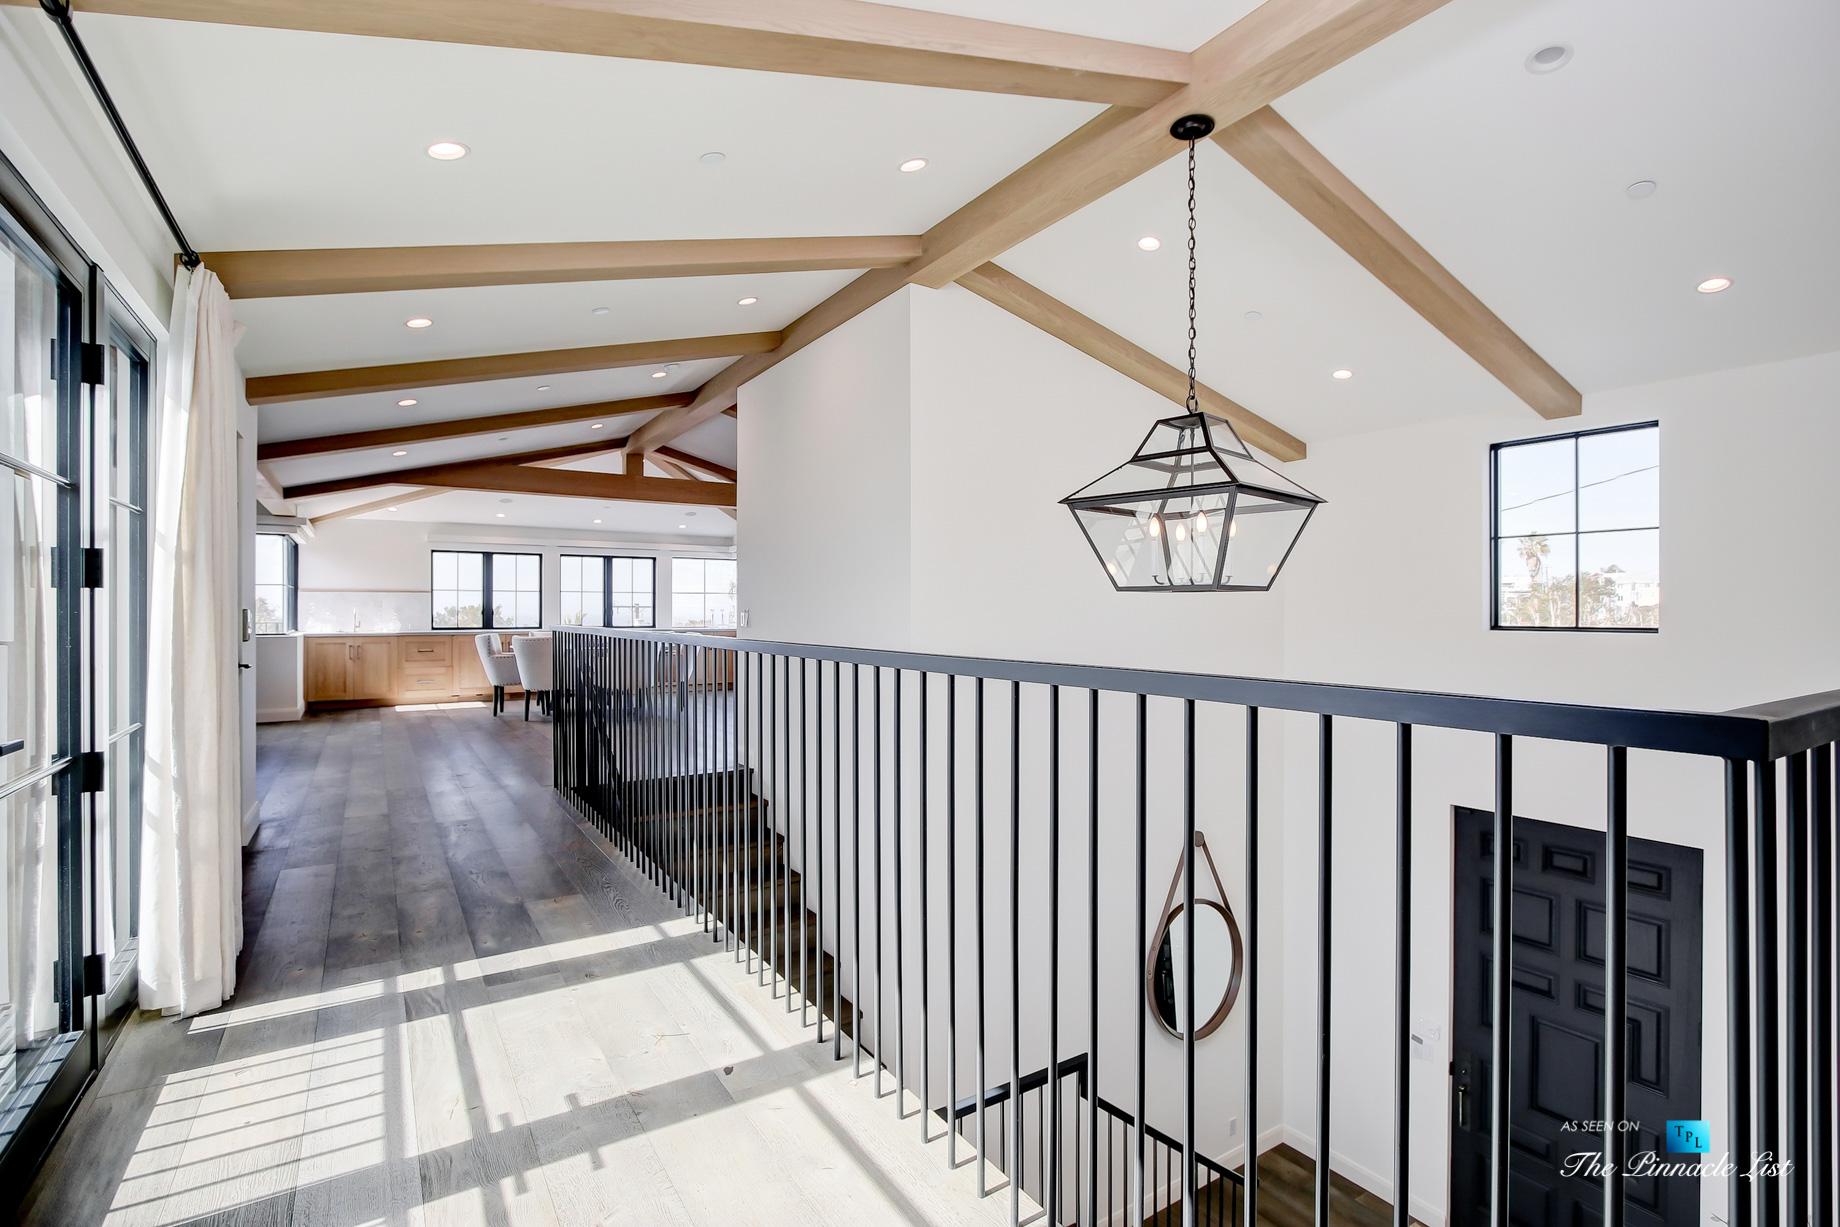 825 Highview Ave, Manhattan Beach, CA, USA - Upper Hallway - Luxury Real Estate - Modern Spanish Home